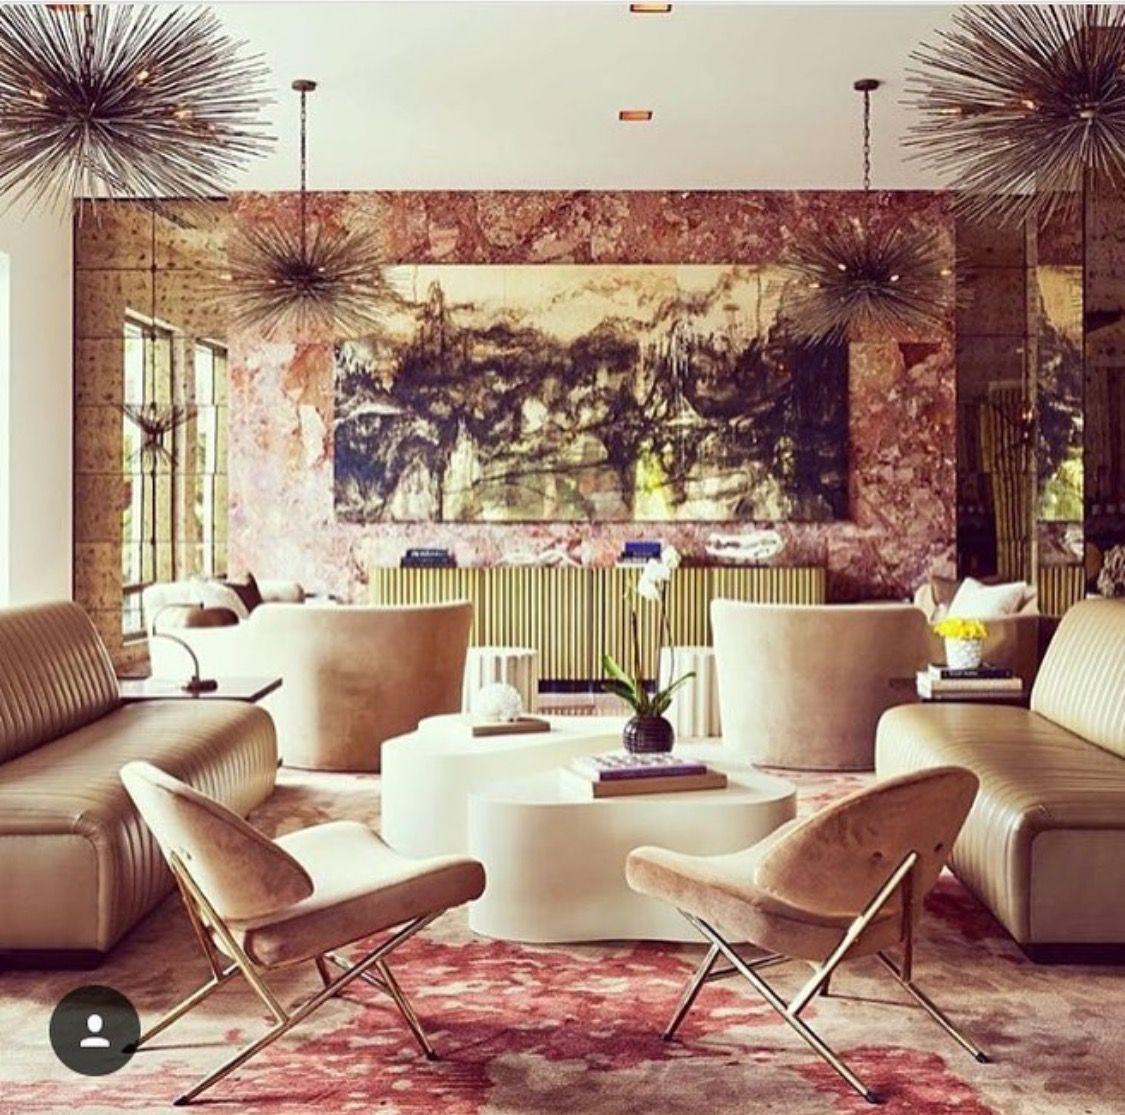 The Living Room Bar Miami: South Beach Miami